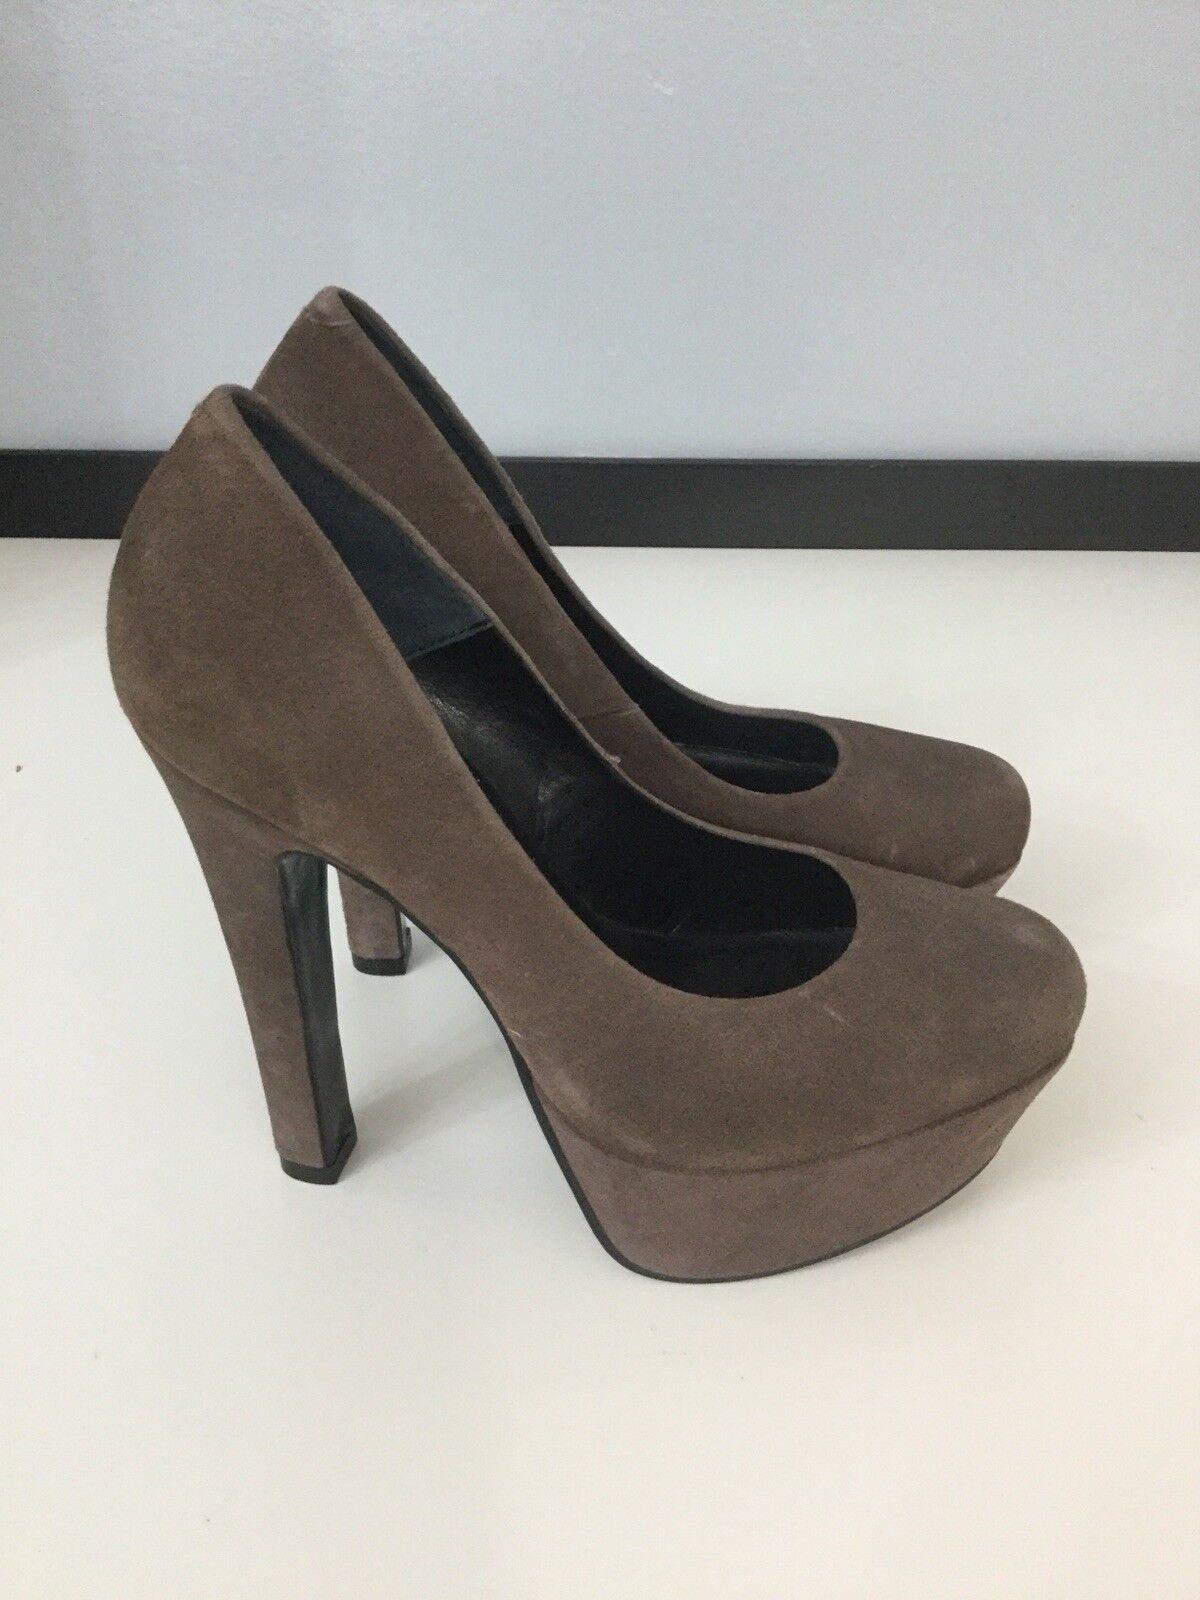 Kurt Geiger Womans marron Faux Suede Taille Uk 6 Eu 39 High Heels chaussures